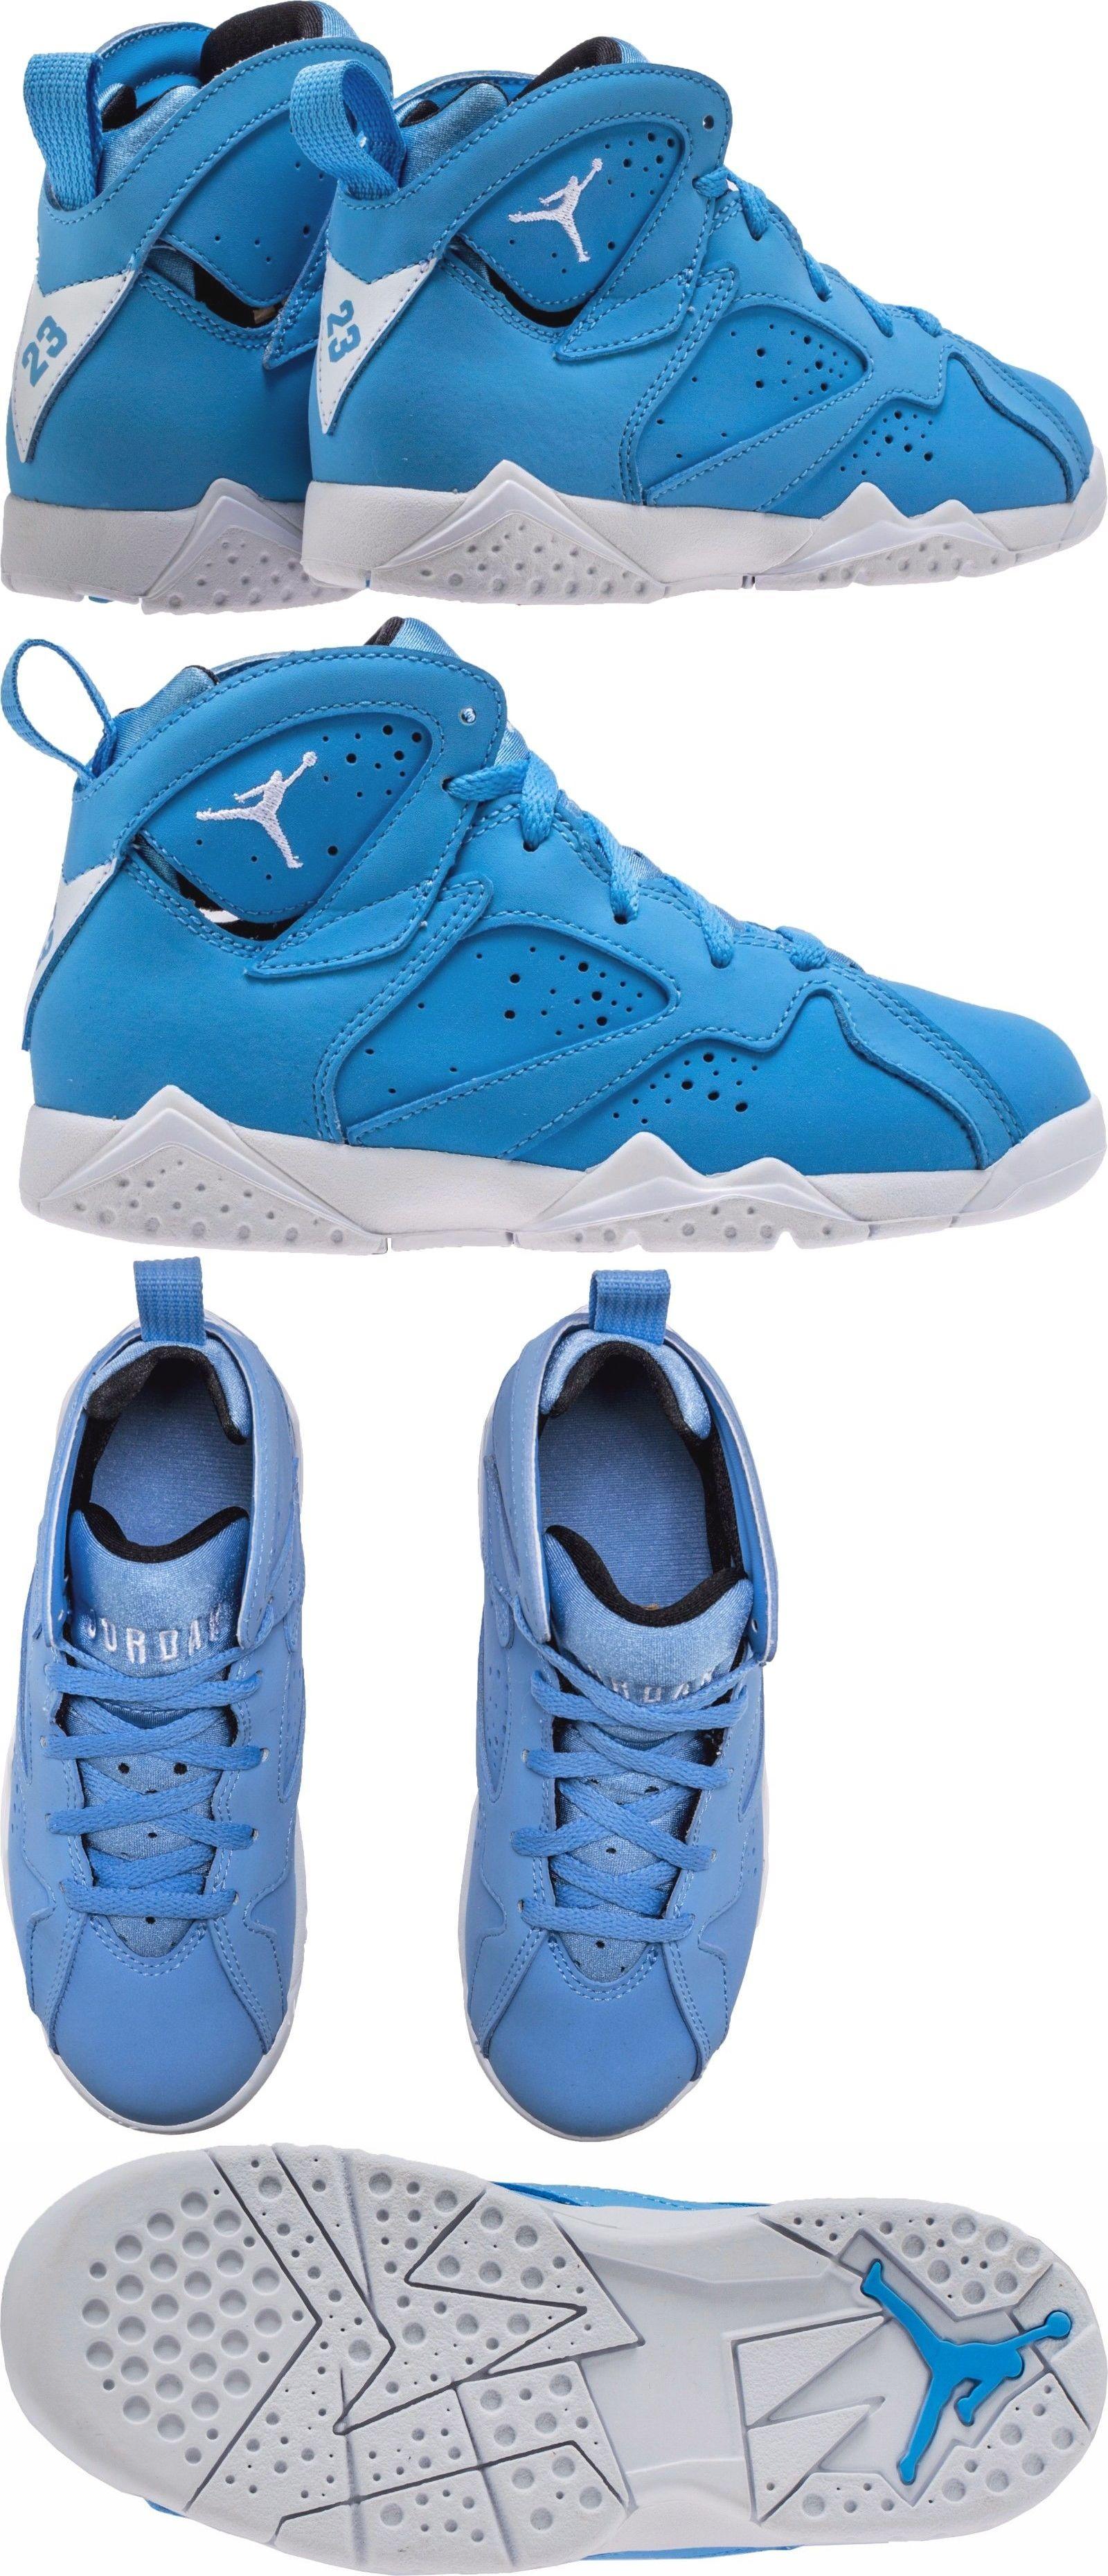 ... Girls Shoes 57974 Nike Air Jordan Retro 7 Pantone University Blue White 304773  400 11.5 ... 4b7048697